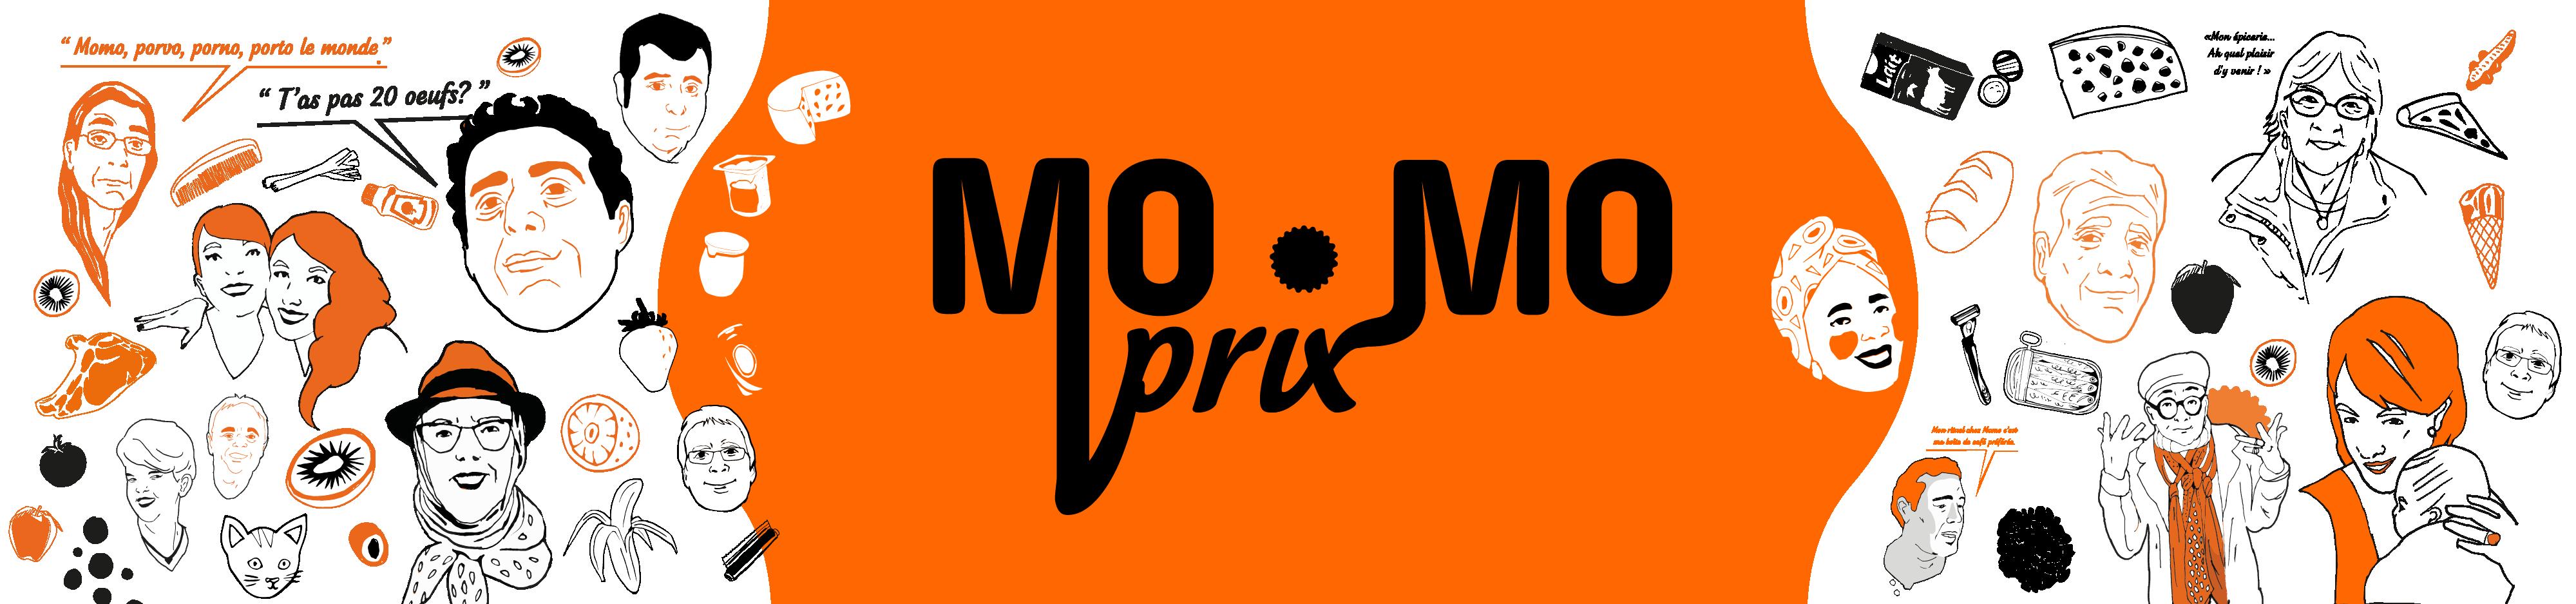 slider-moprixmo-01